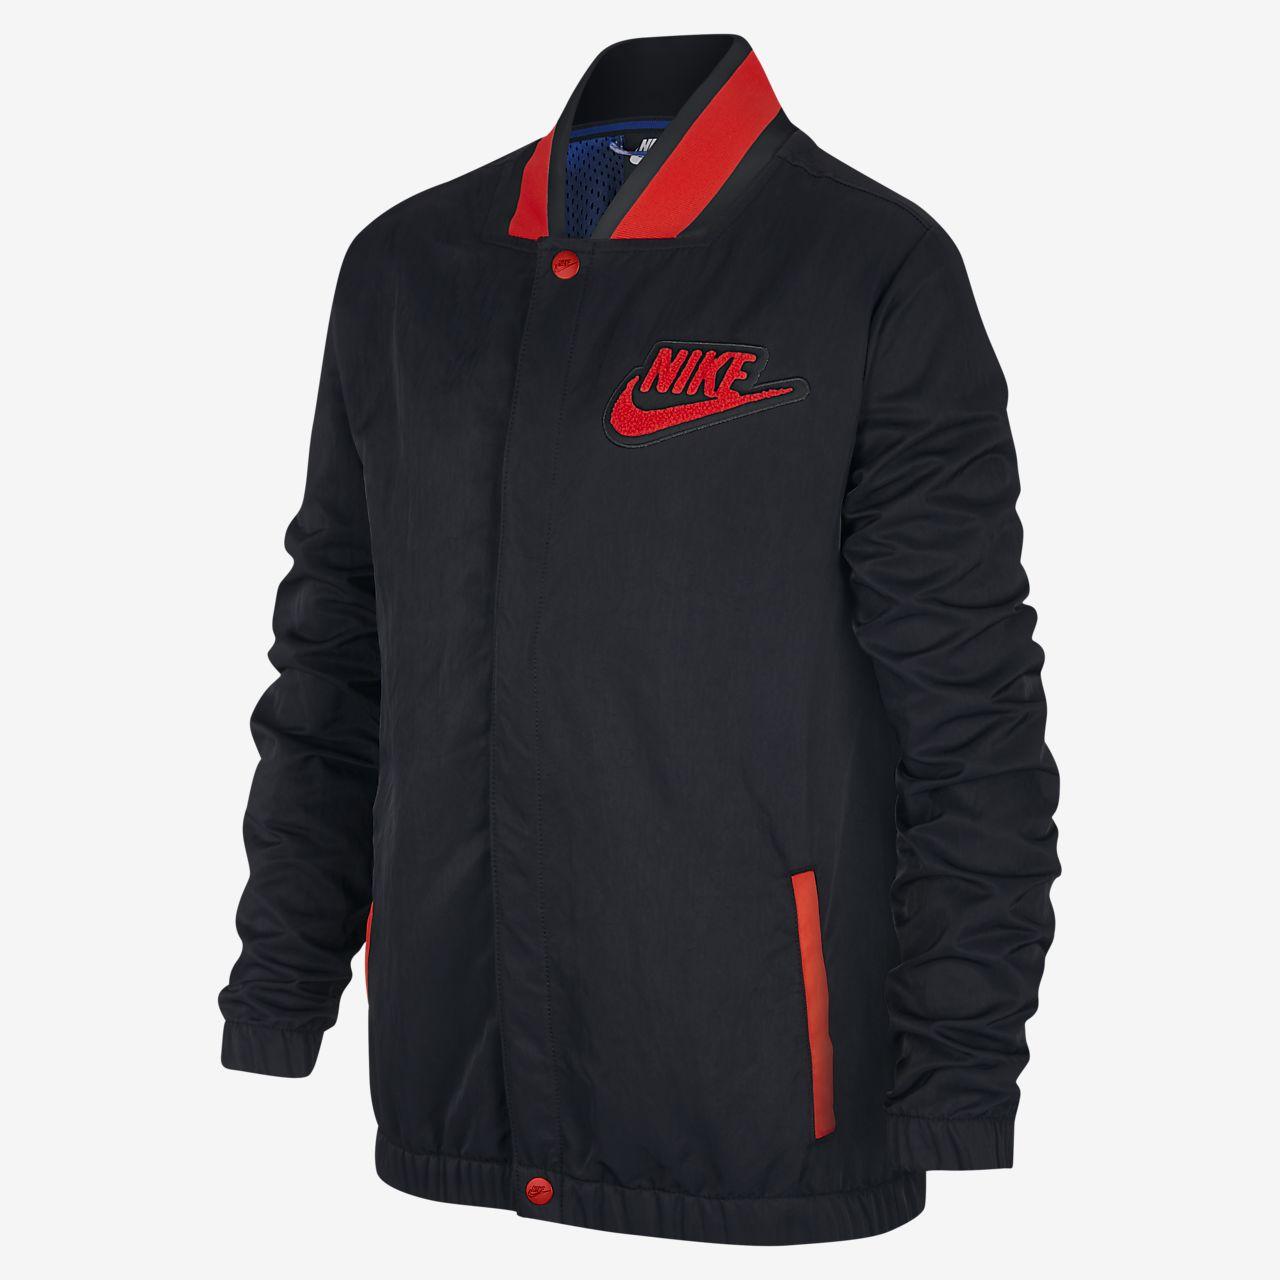 Plus ÂgéFr Pour Garçon Sportswear Veste Nike 3TK1uFJlc